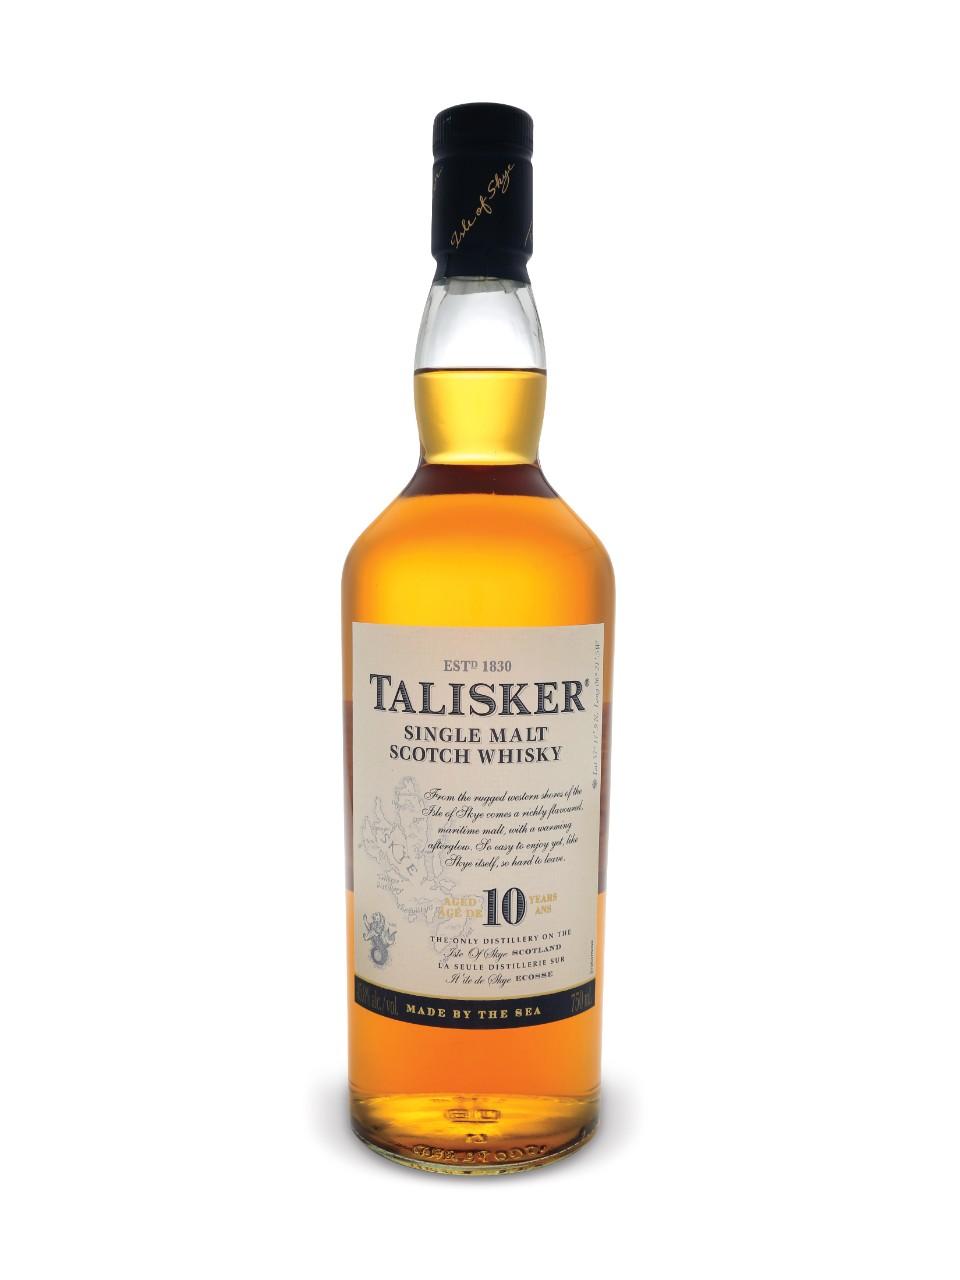 Top 10 single-malt scotch whiskies